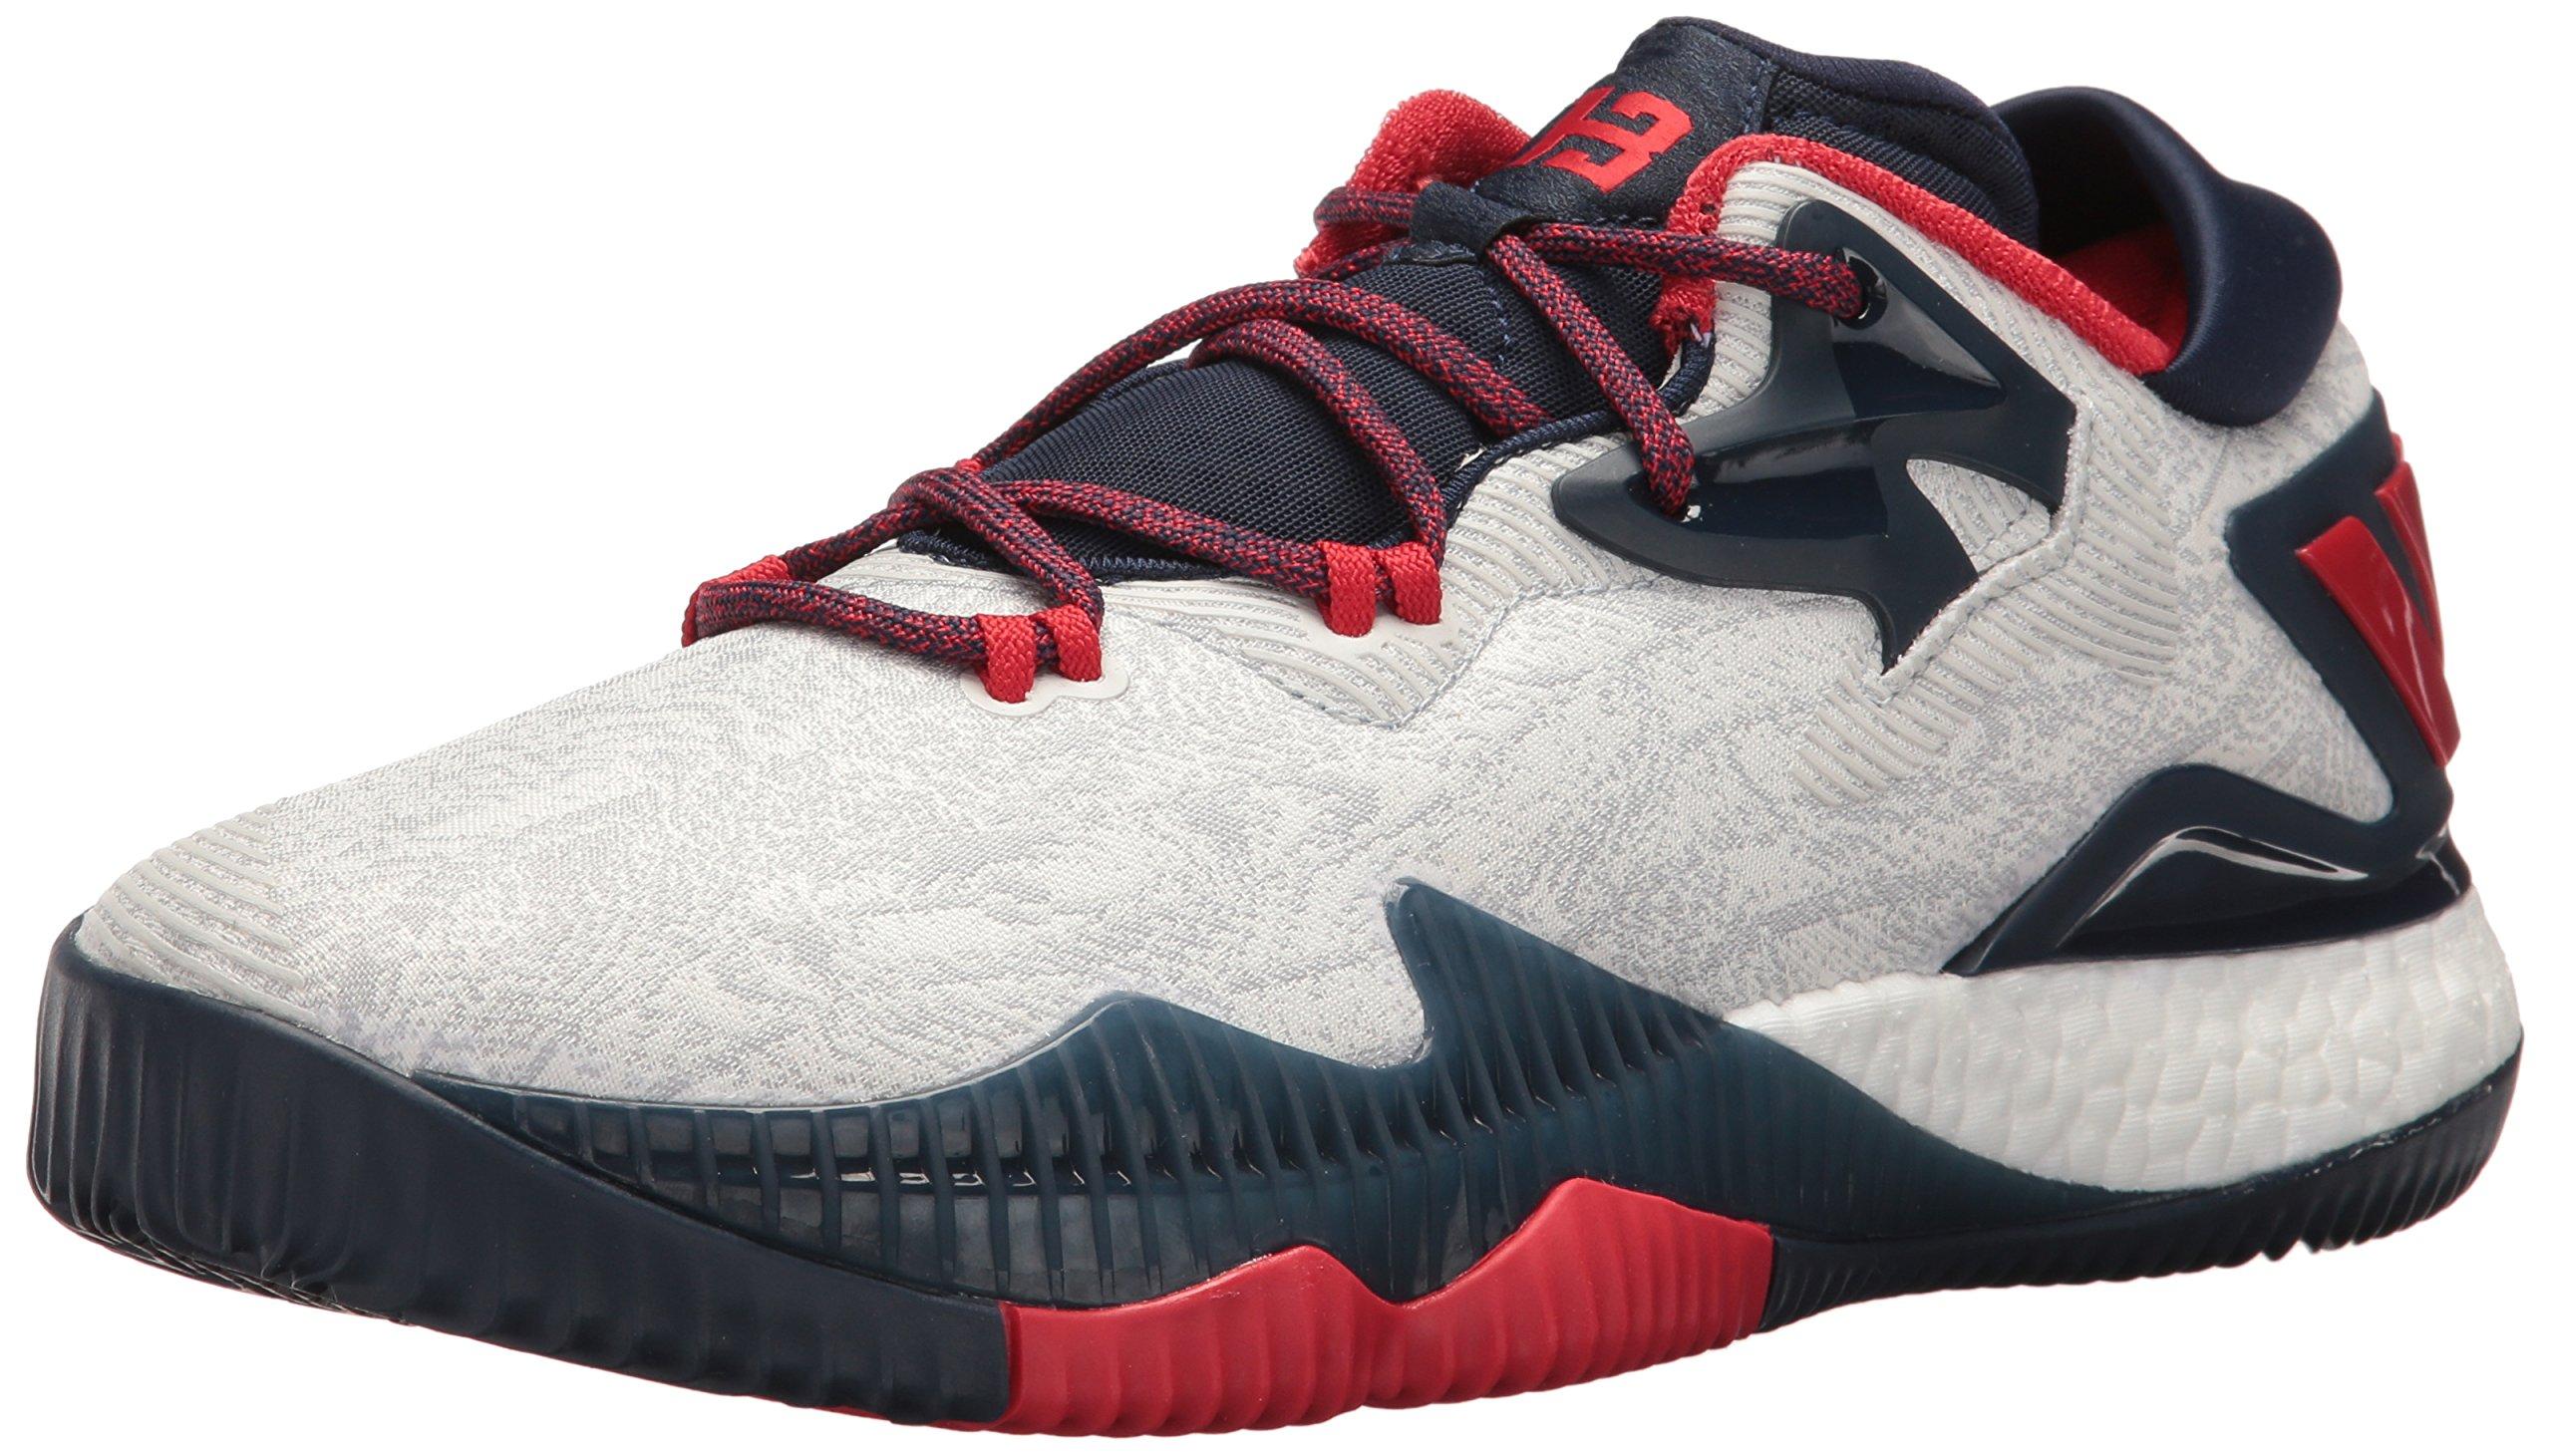 wholesale dealer cozy fresh special sales Galleon - Adidas Men's Crazylight Boost Low 2016 Basketball Shoe ...